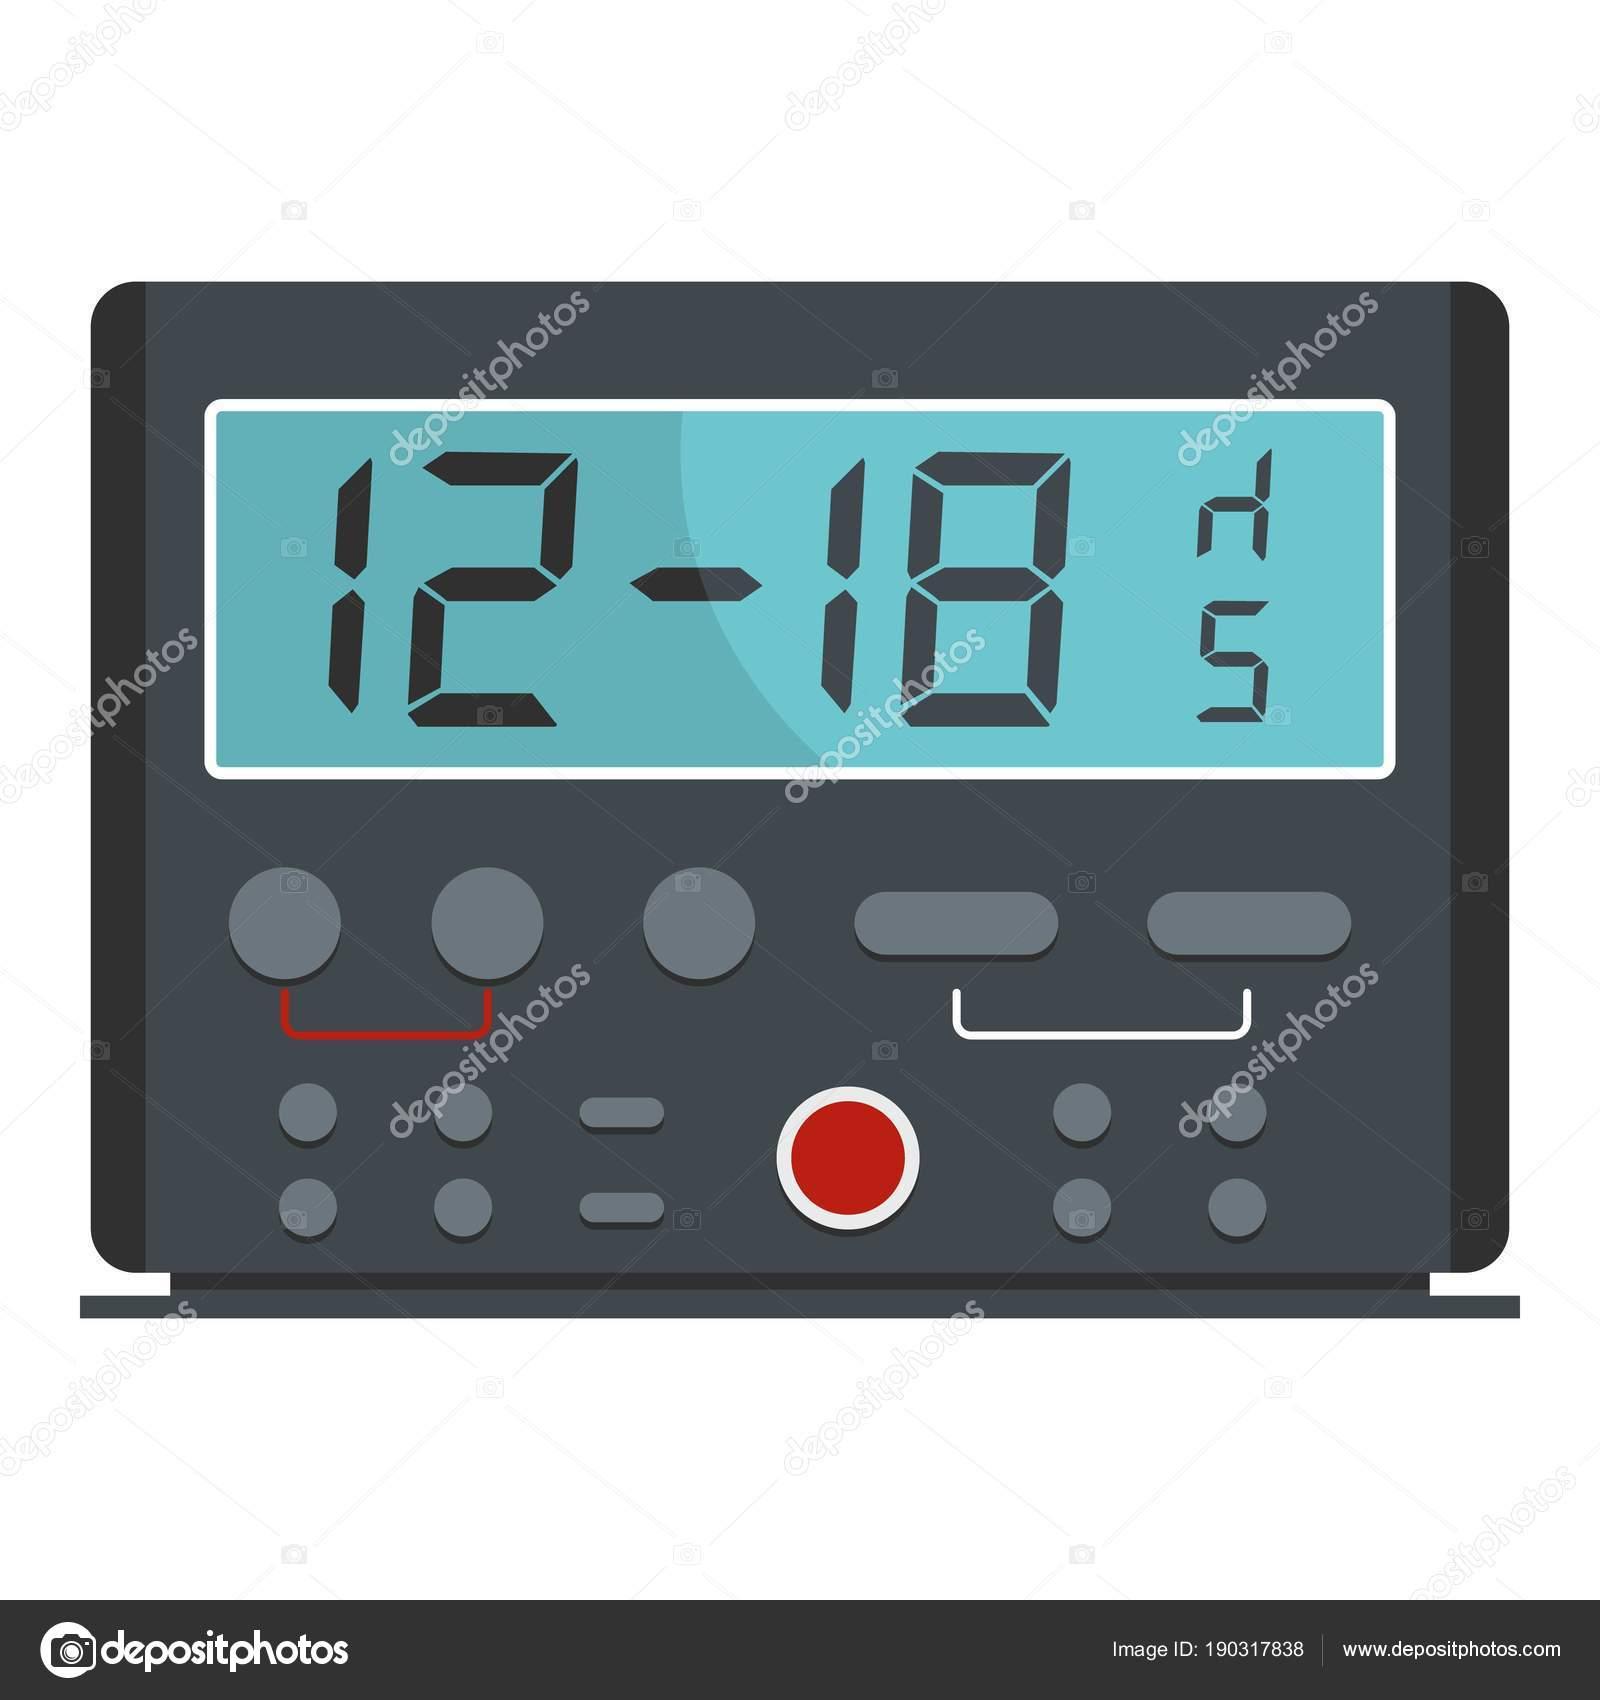 kitchen timer faucets best 厨房定时器图标 平面样式 图库矢量图像 c anatolir 190317838 图库矢量图片